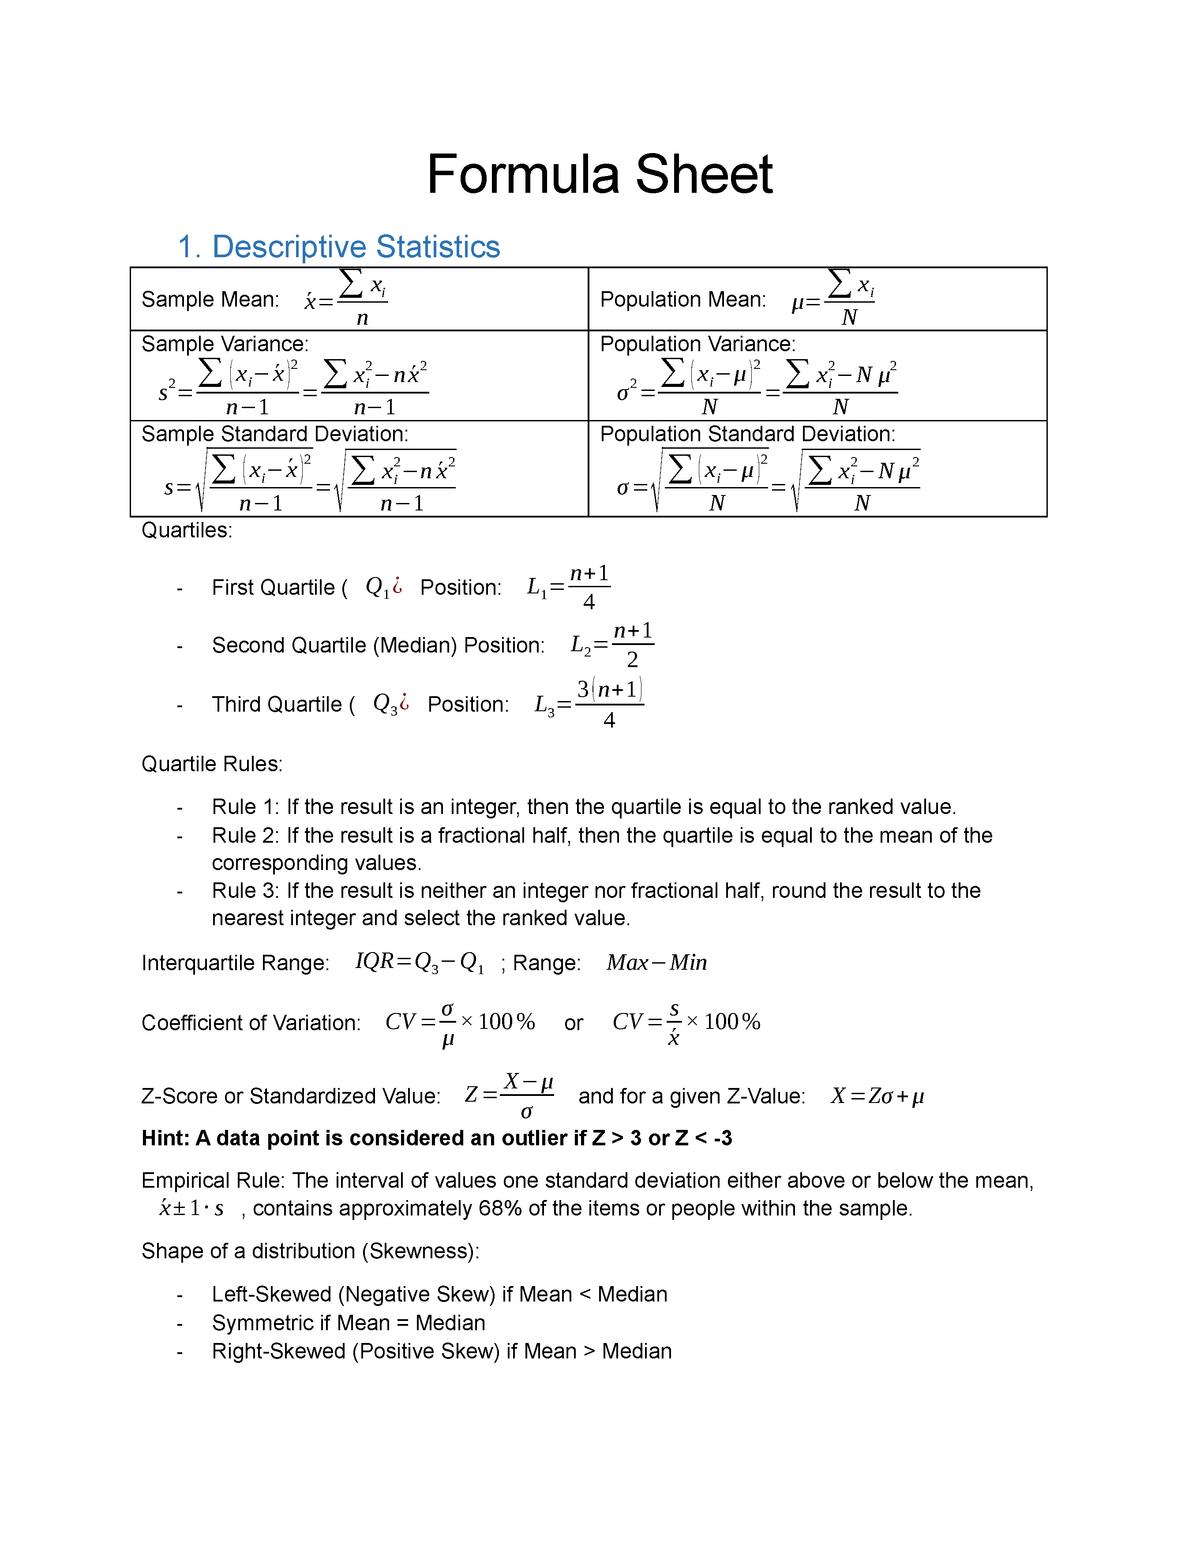 Formula Sheet - ECON1030 Business Statistics - RMIT - StuDocu